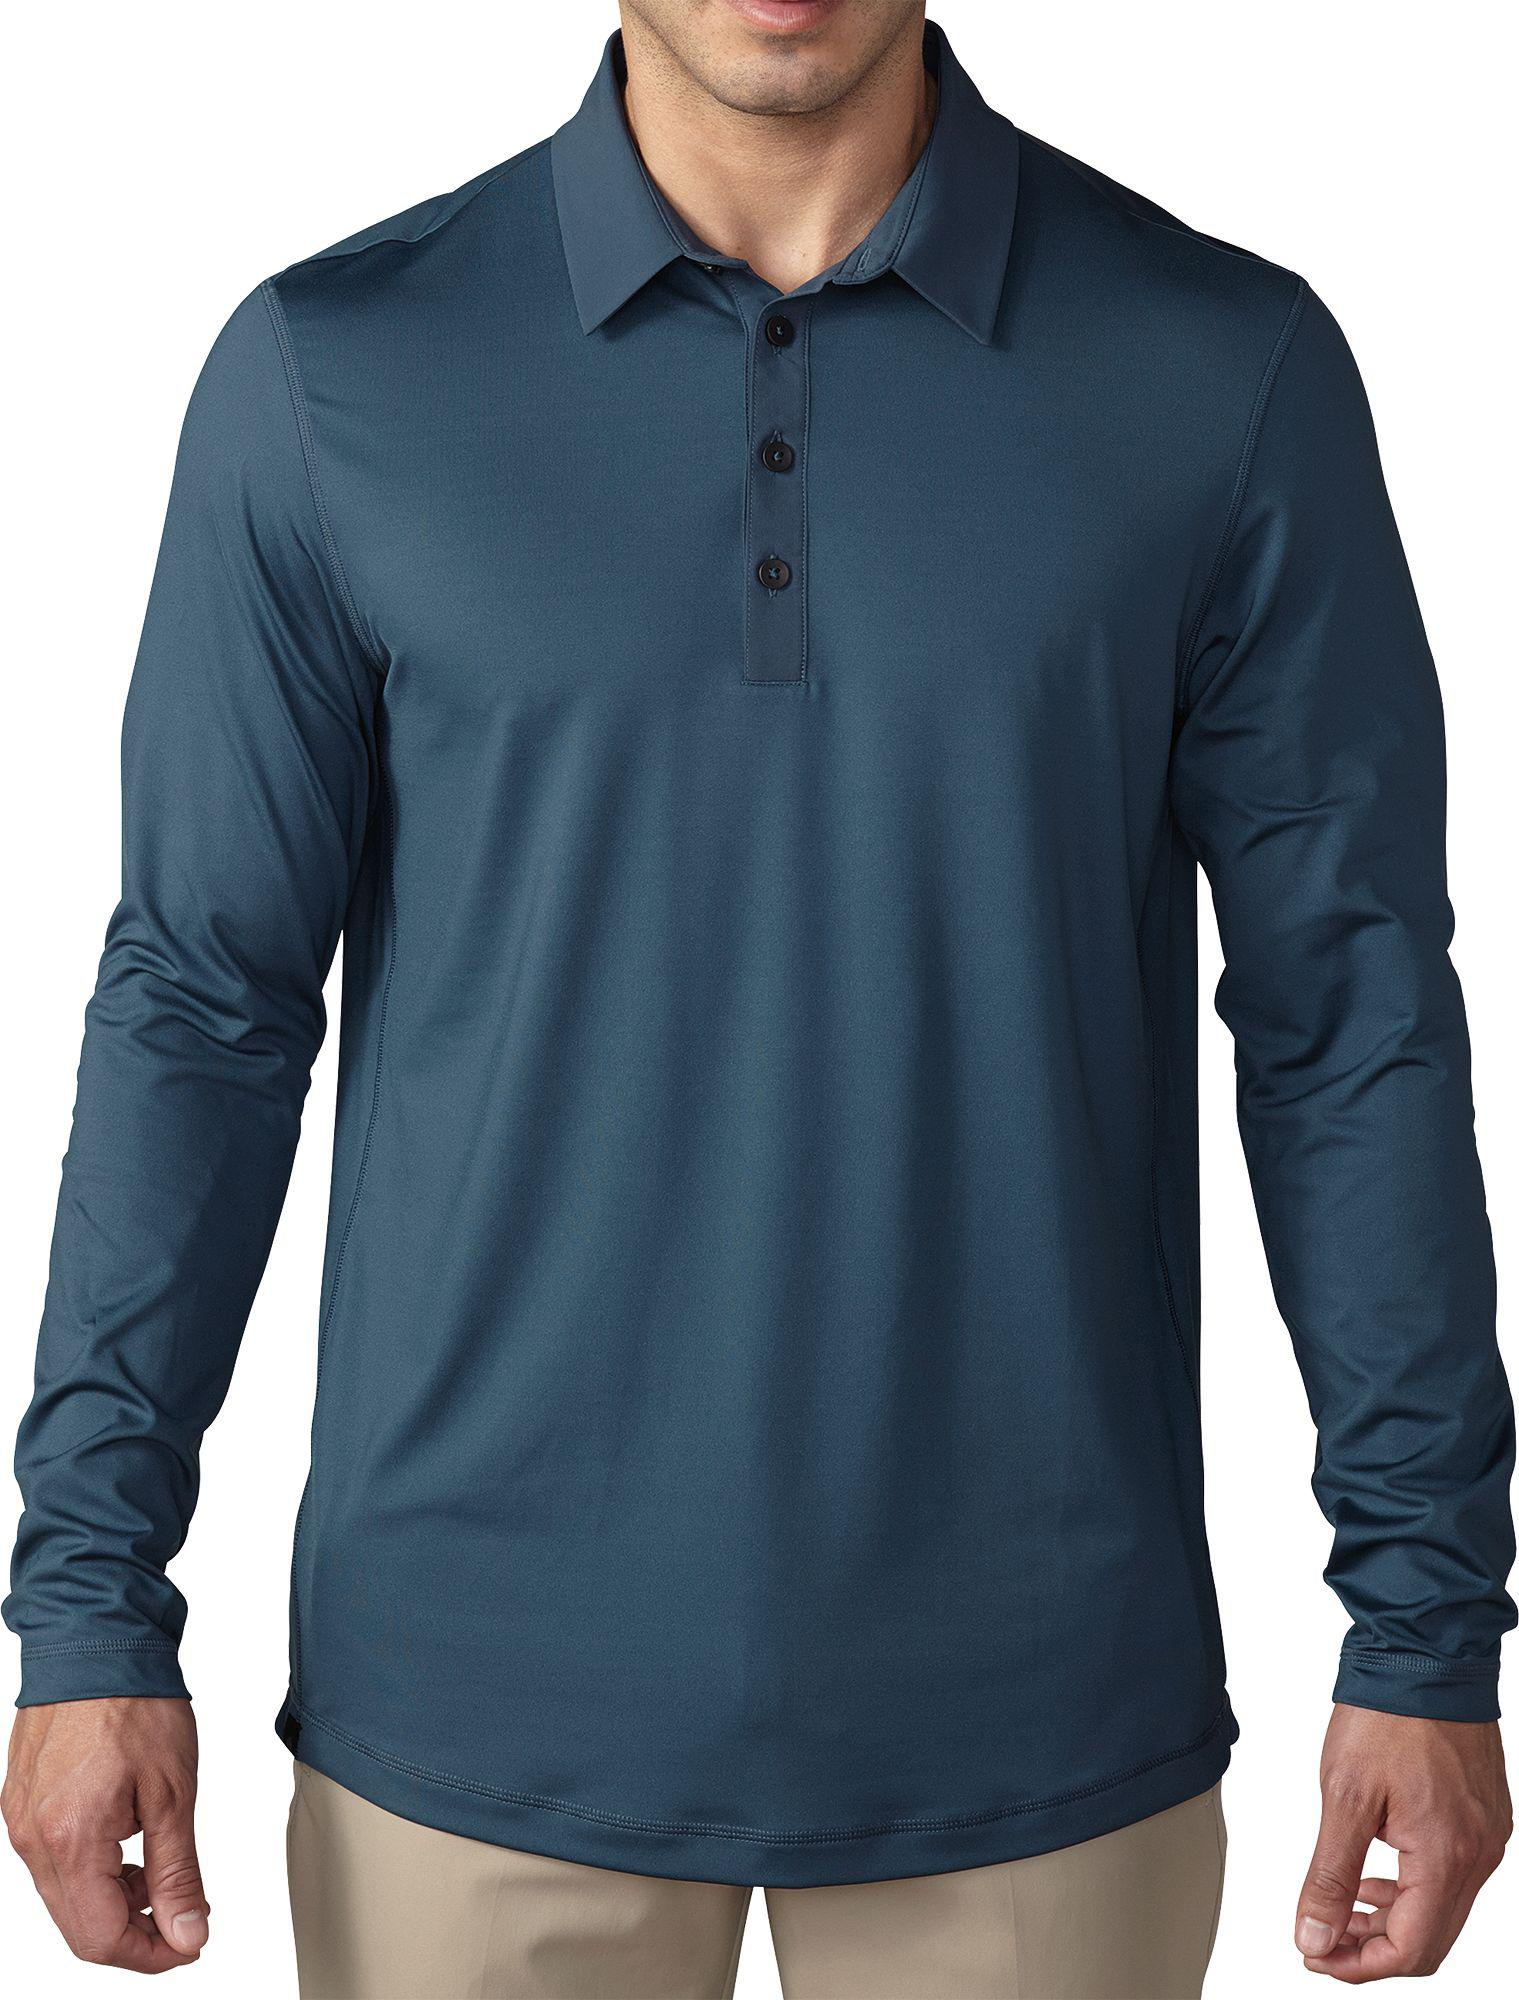 Lyst Adidas Climacool Upf Long Sleeve Golf Polo In Blue